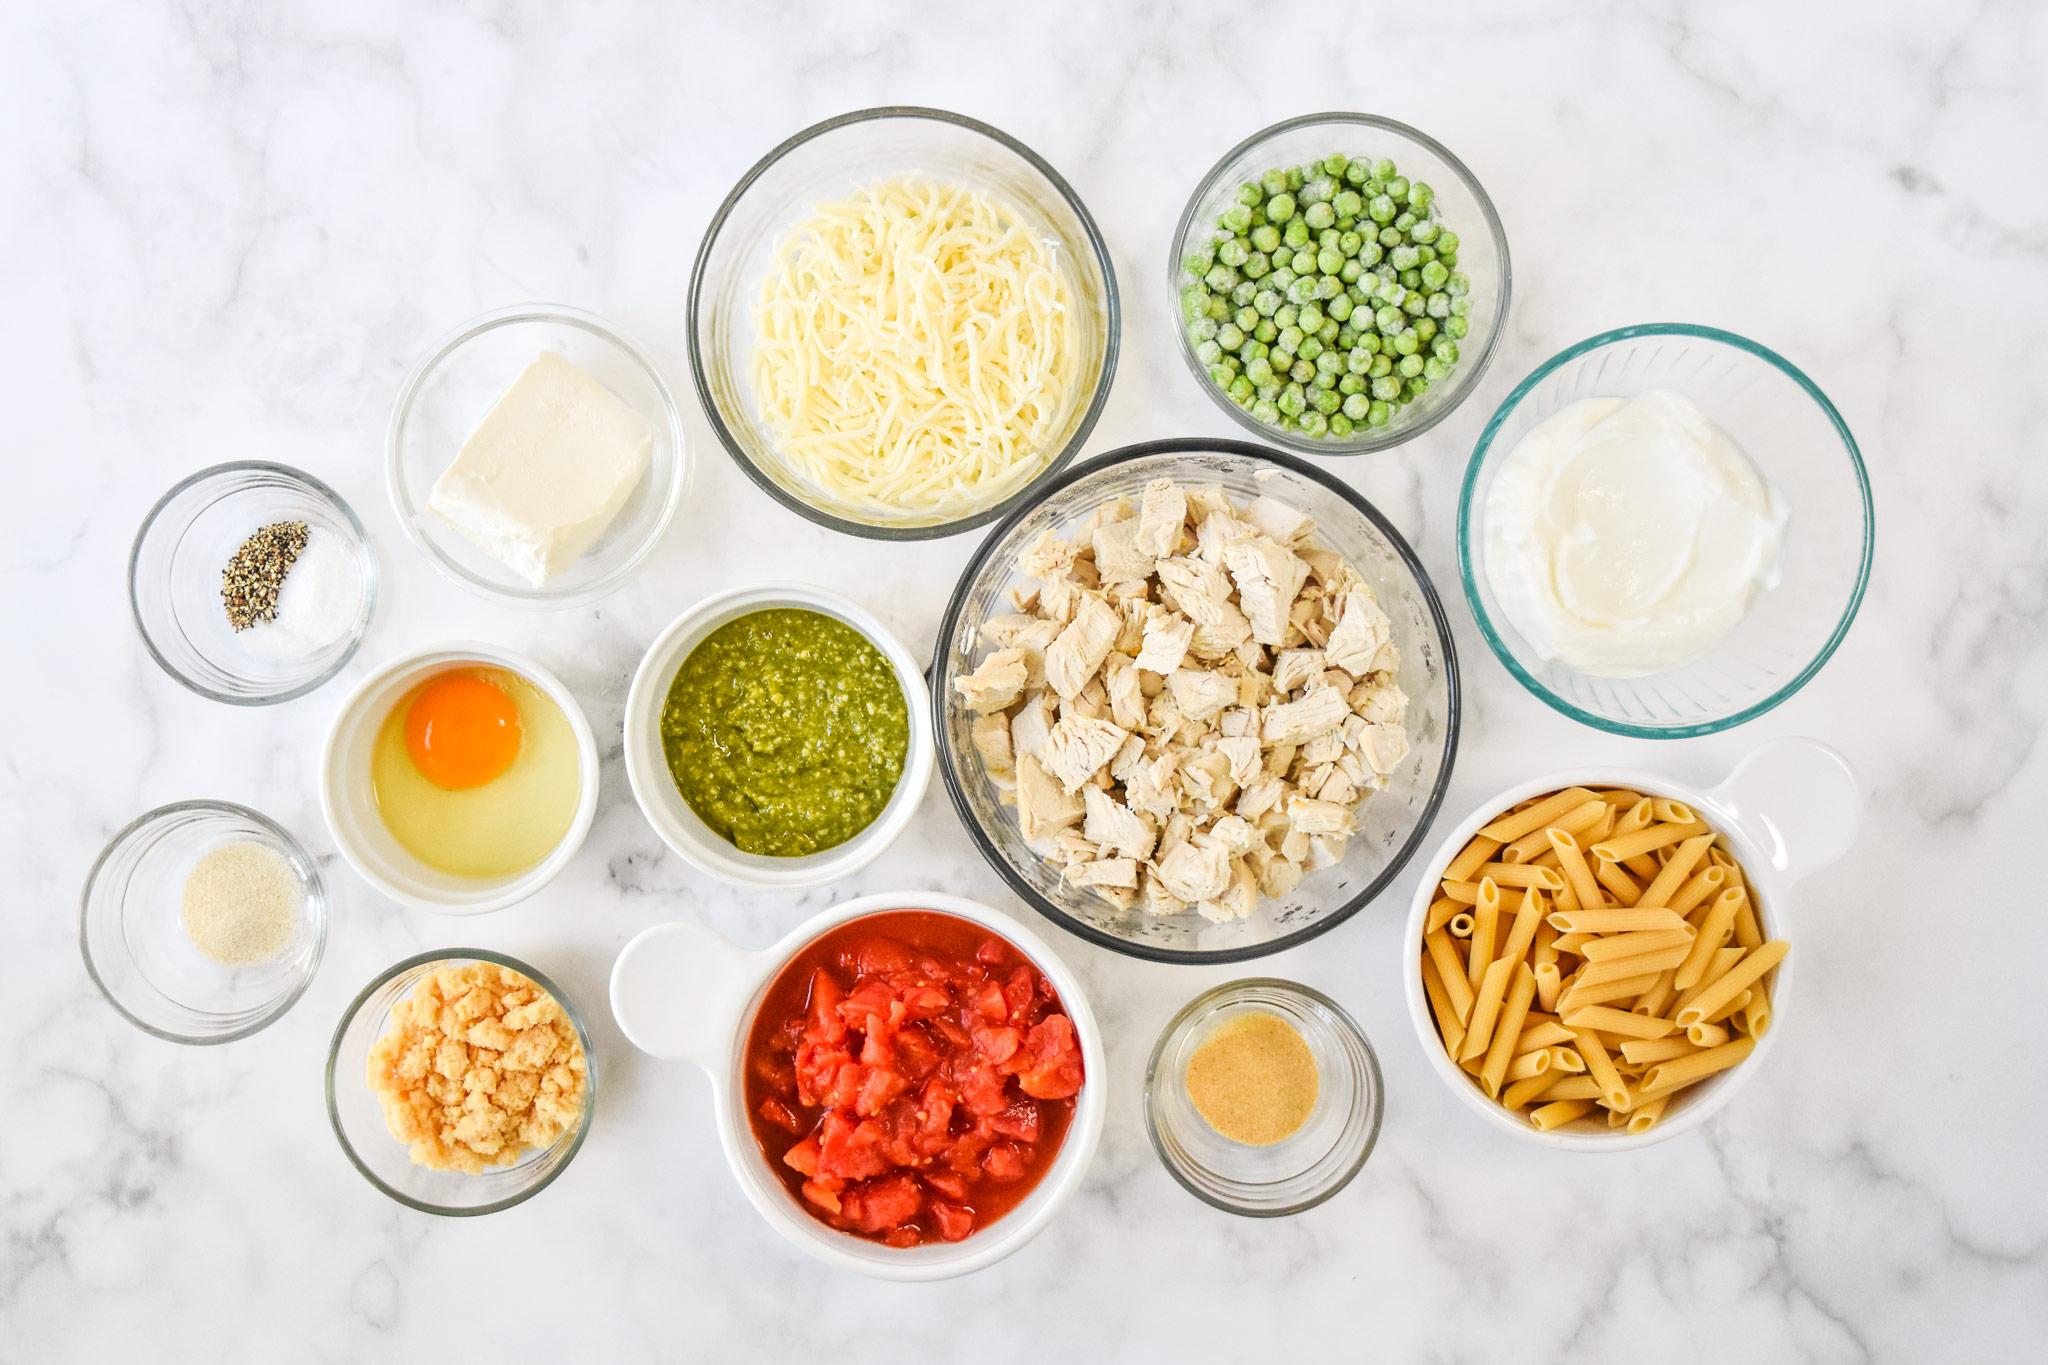 ingredients in bowls ready to make the creamy pesto pasta chicken bake.